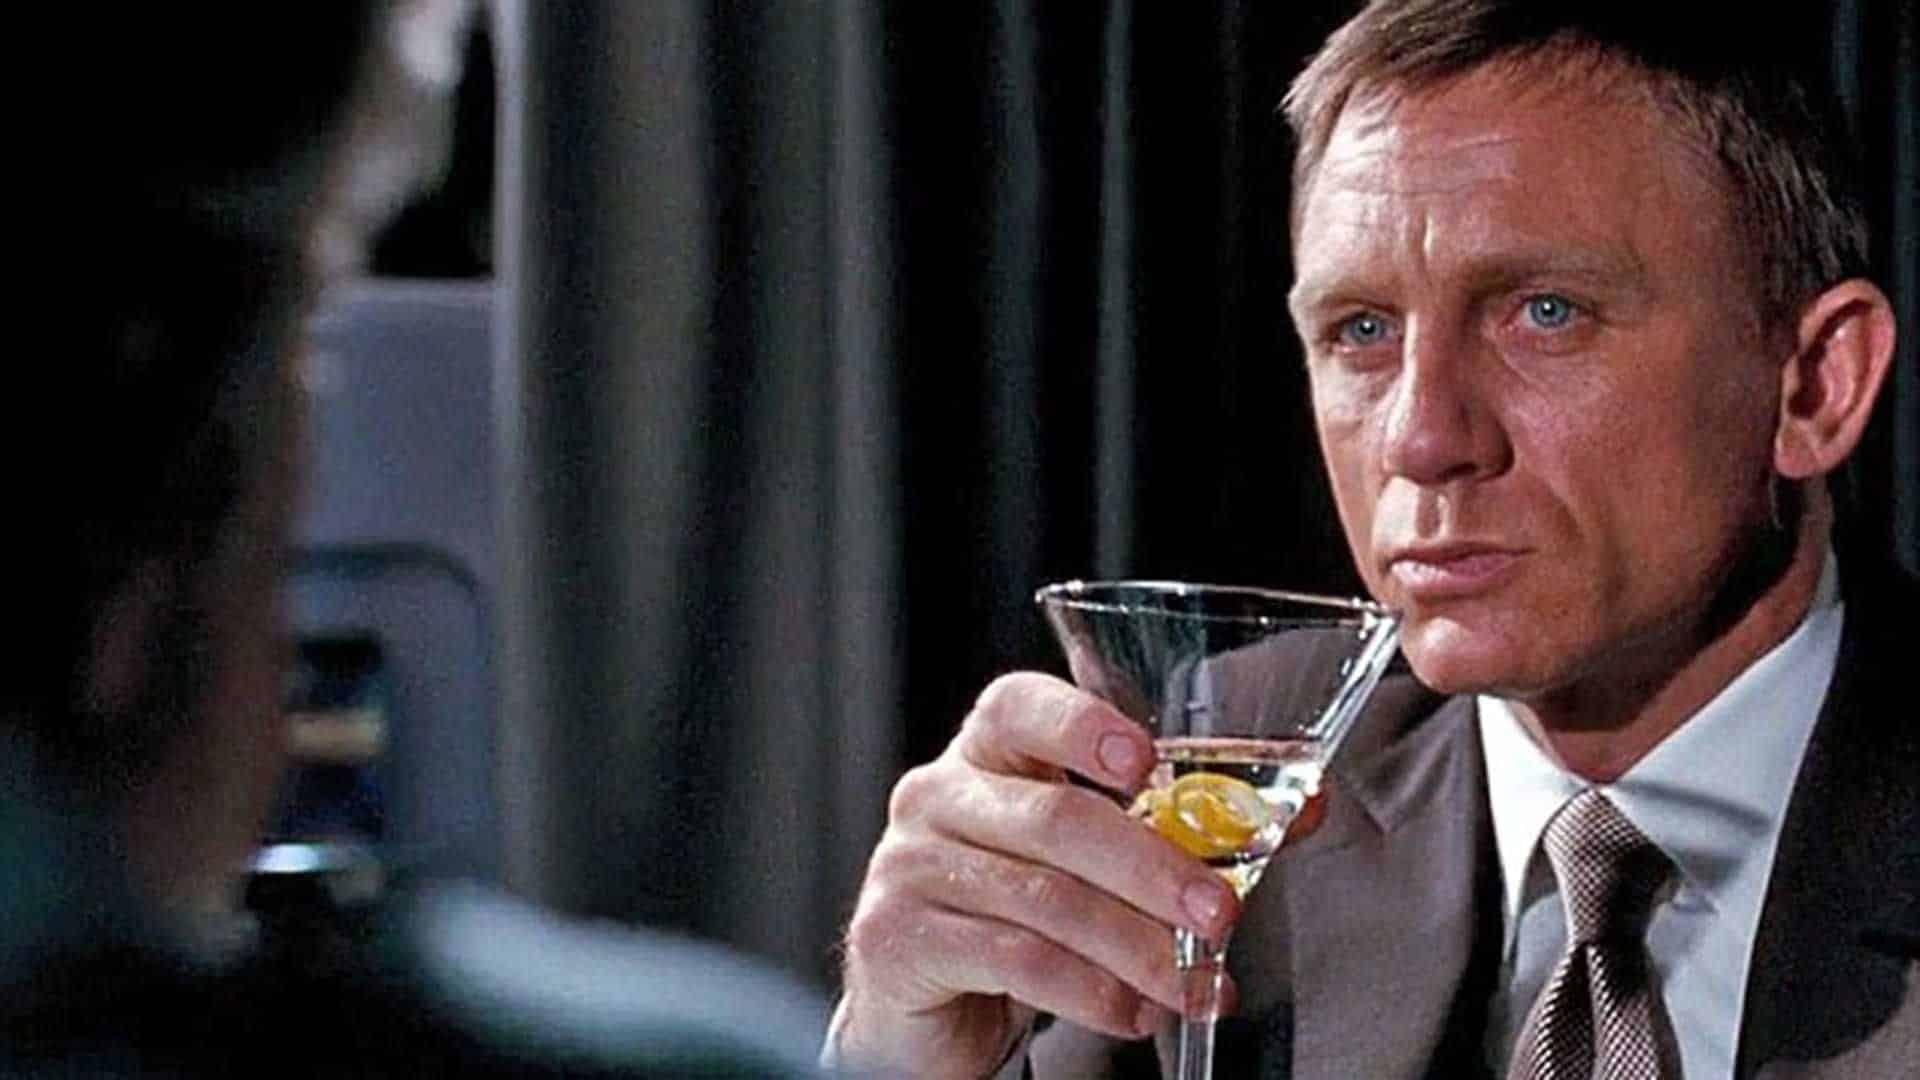 Cócteles de cine bond vesper martini